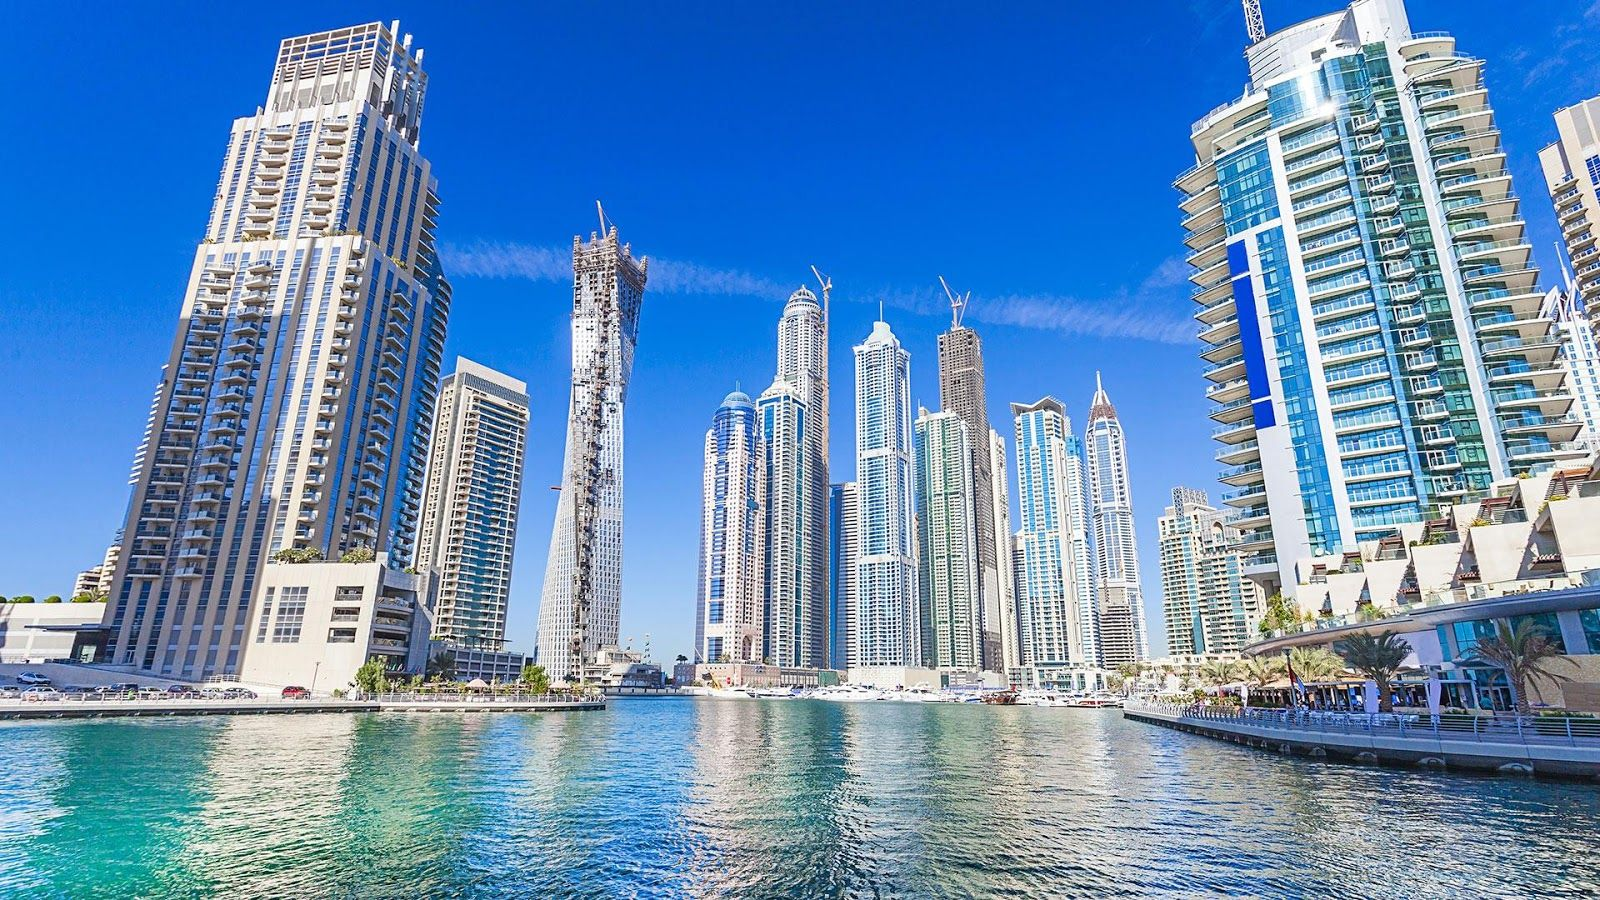 Дубай фото hd купить квартиру шарм эль шейхе